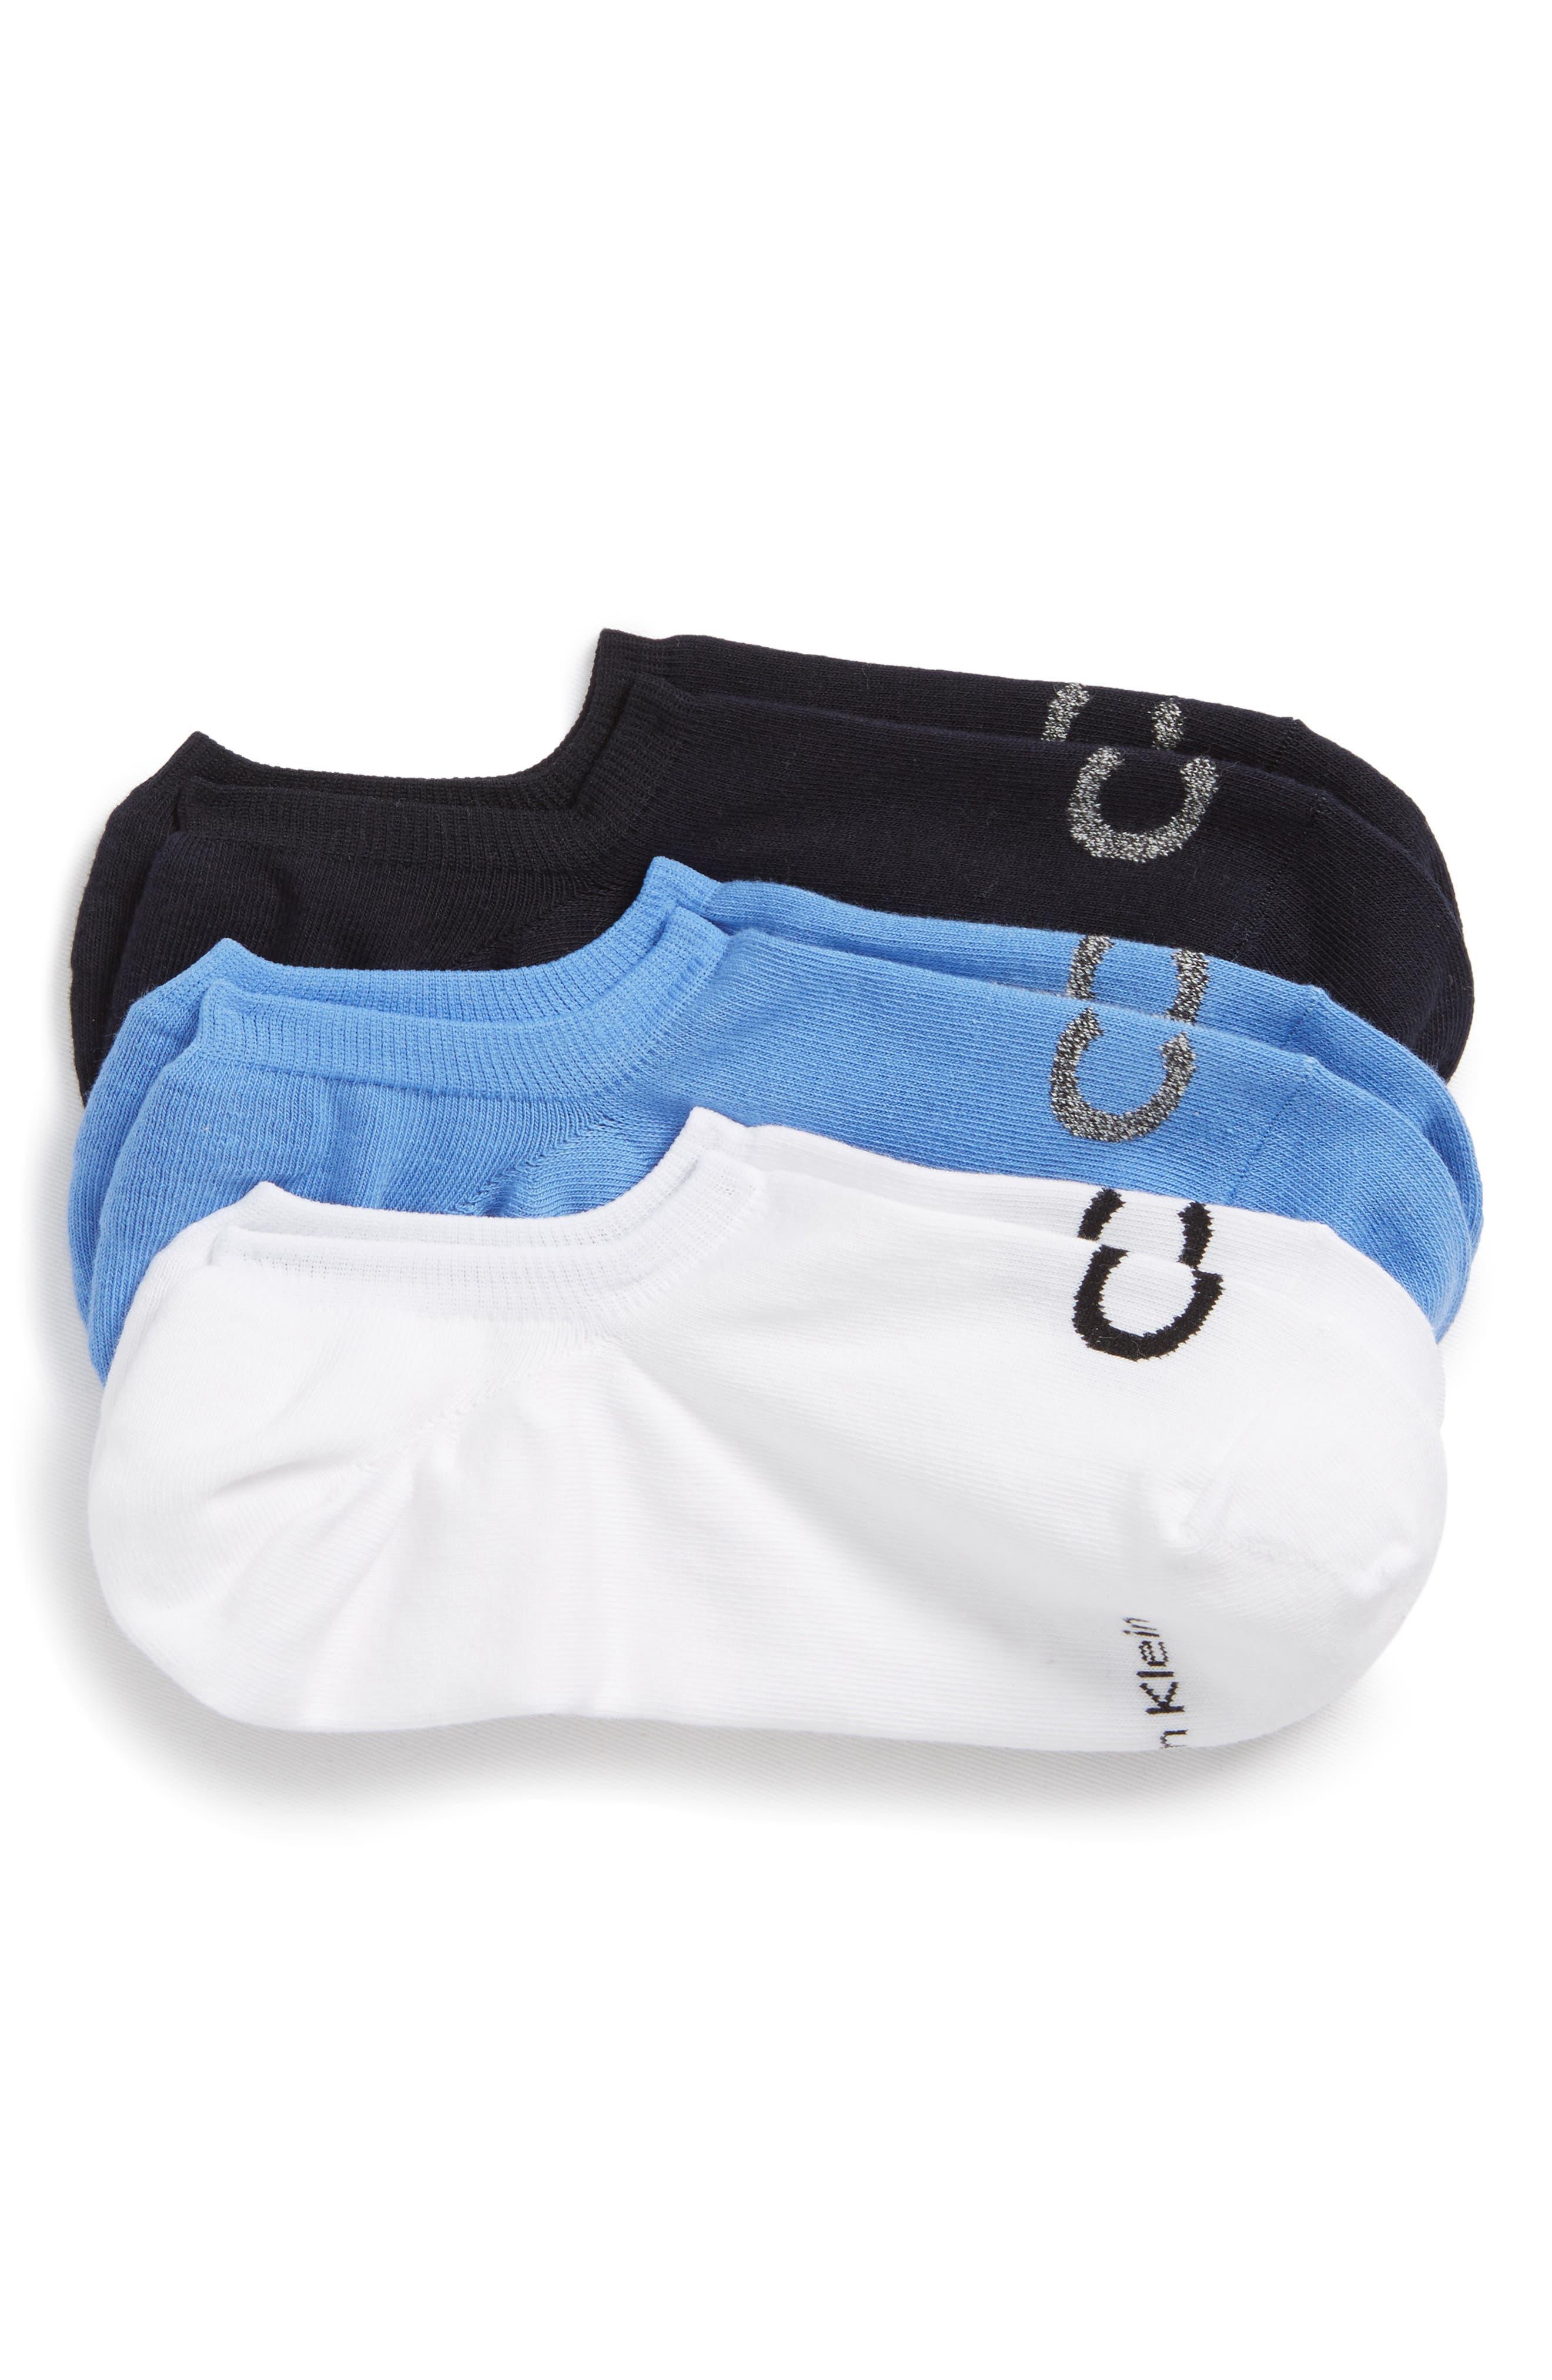 3-Pack No-Show Socks,                         Main,                         color, ULTRAMARINE/ NAVY/ WHITE